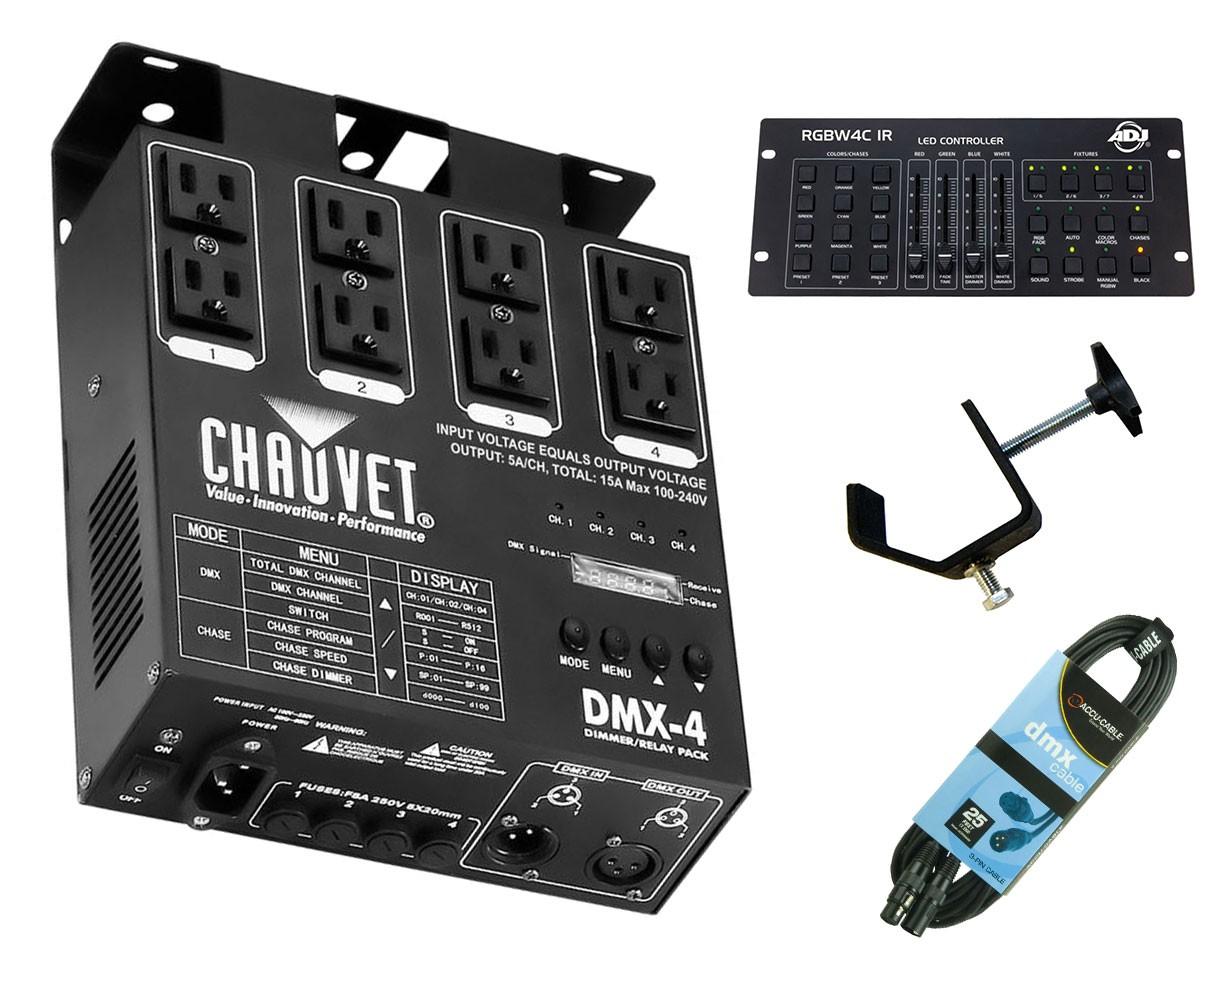 Chauvet DMX-4 + RGBW4C IR + Clamp + Cable